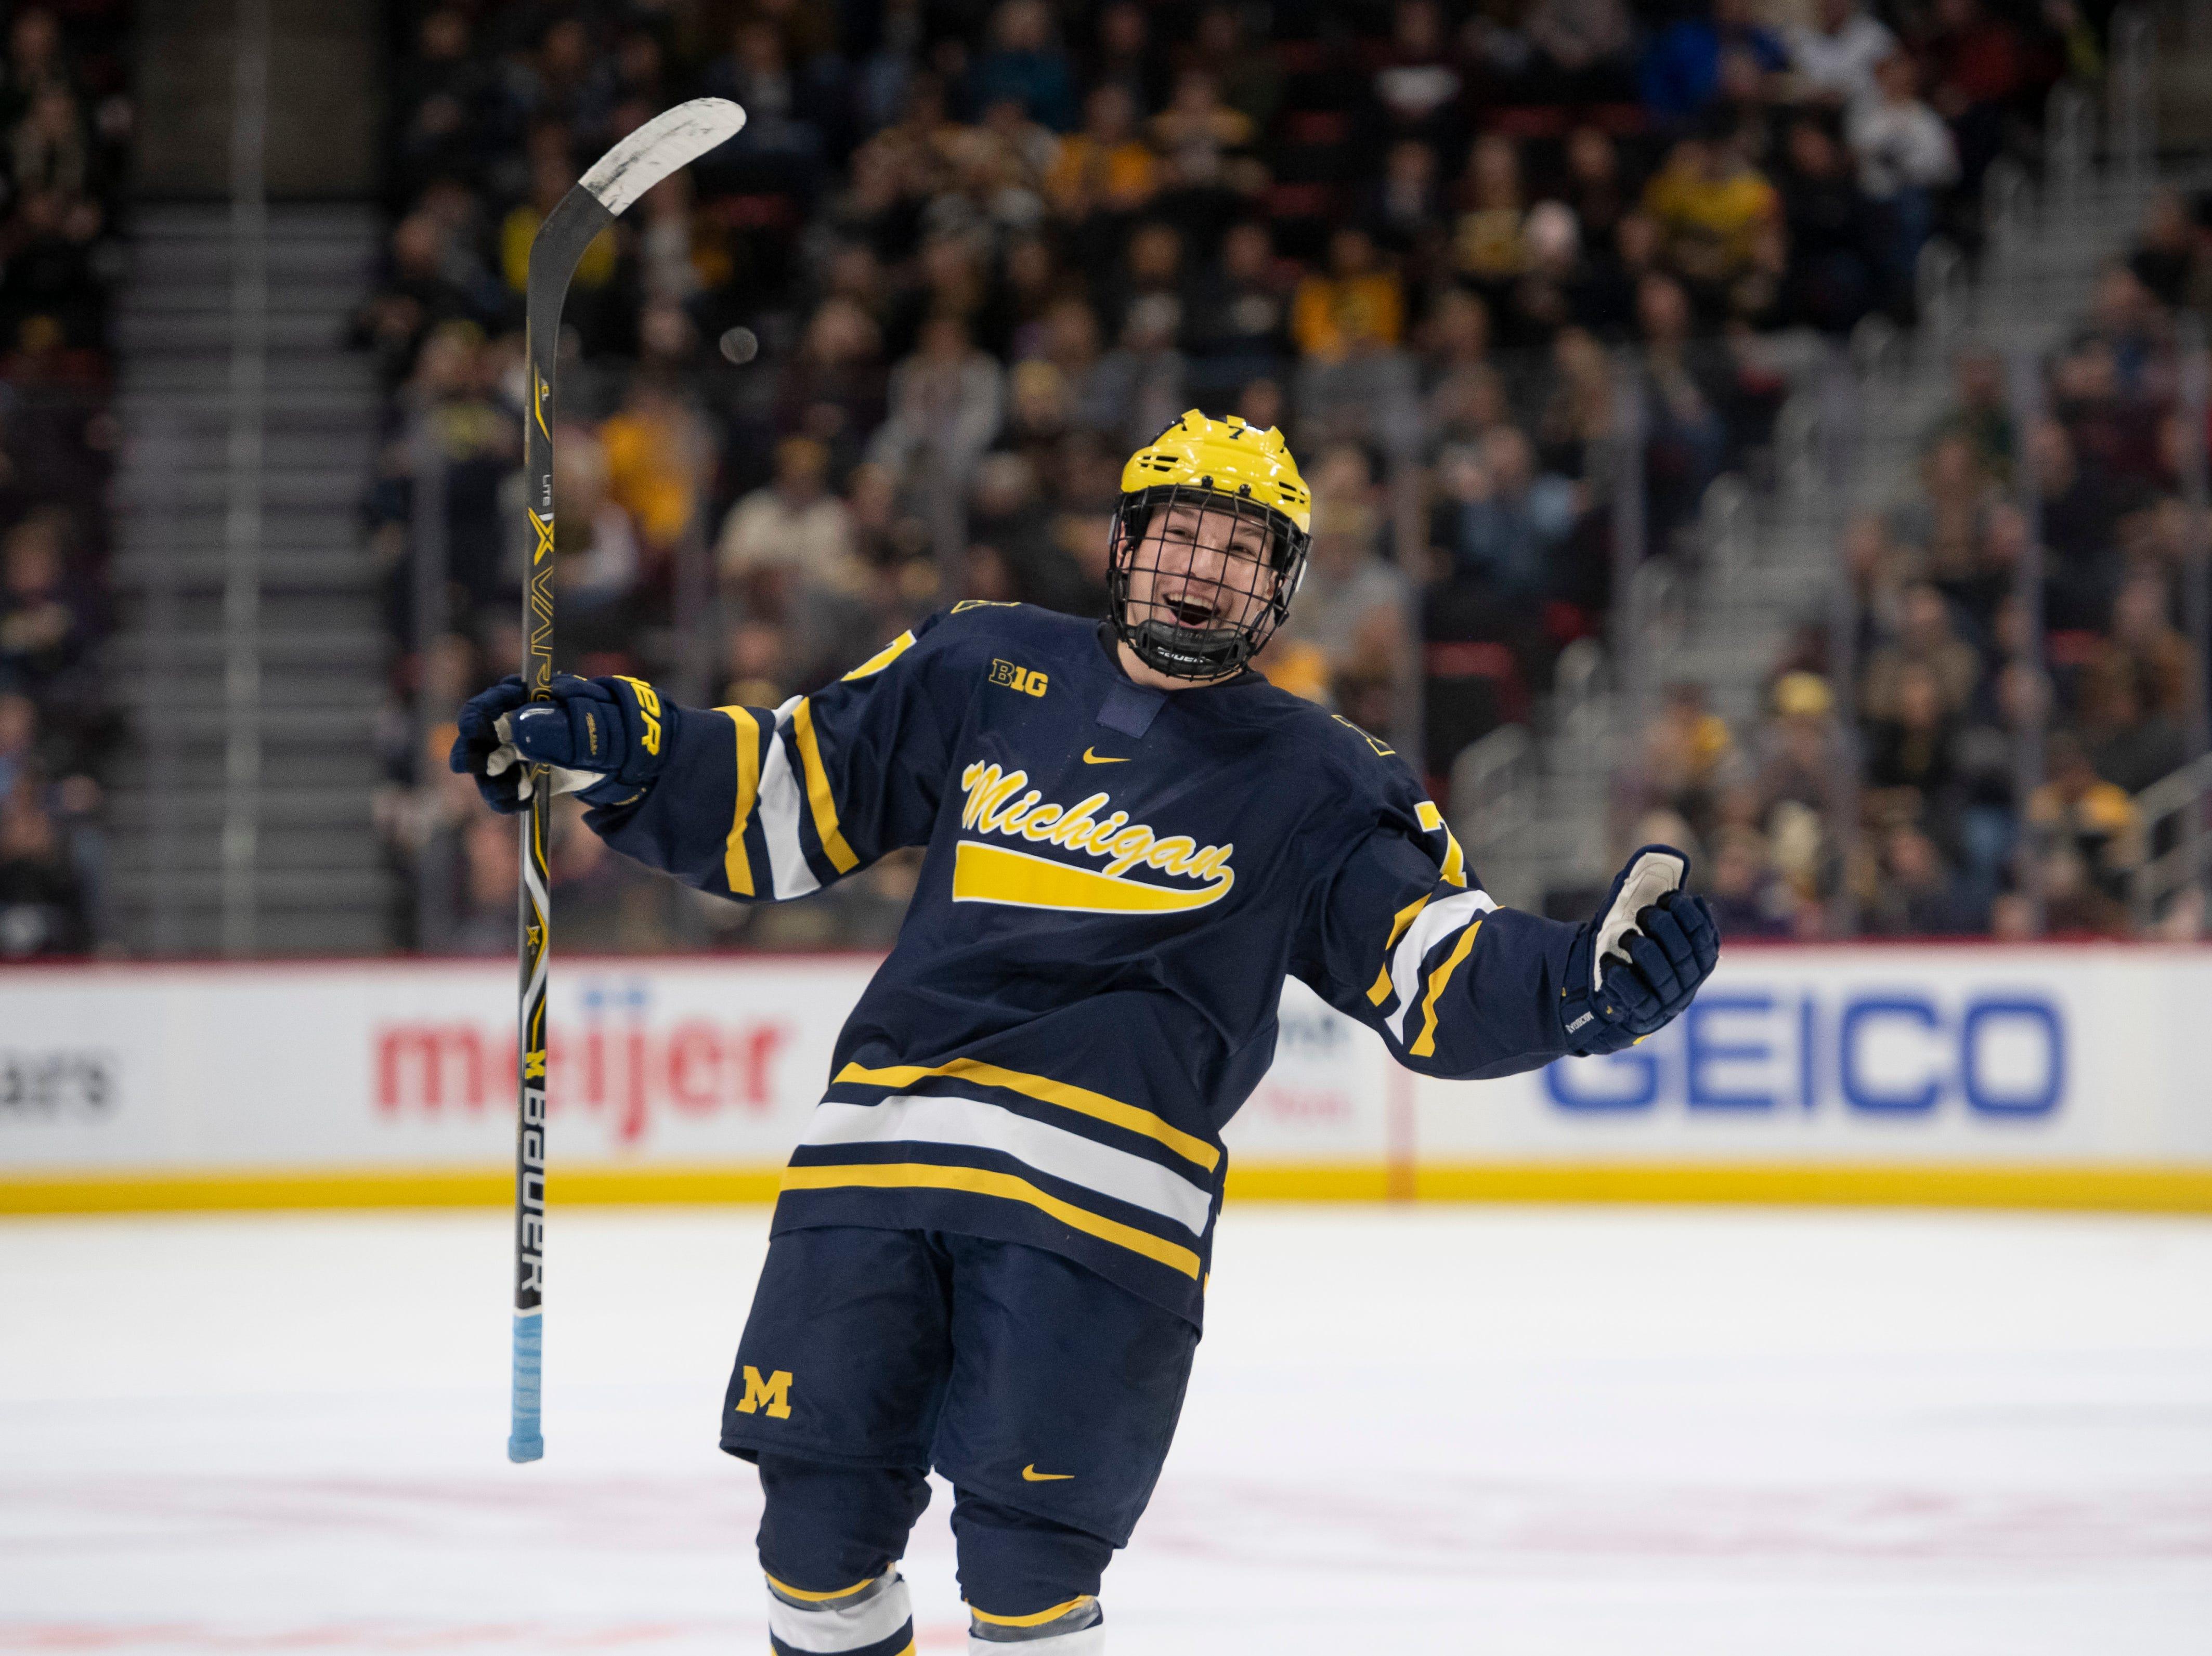 Michigan defenseman Nick Blankenburg celebrates after teammate Adam Winborg scored in the second period.